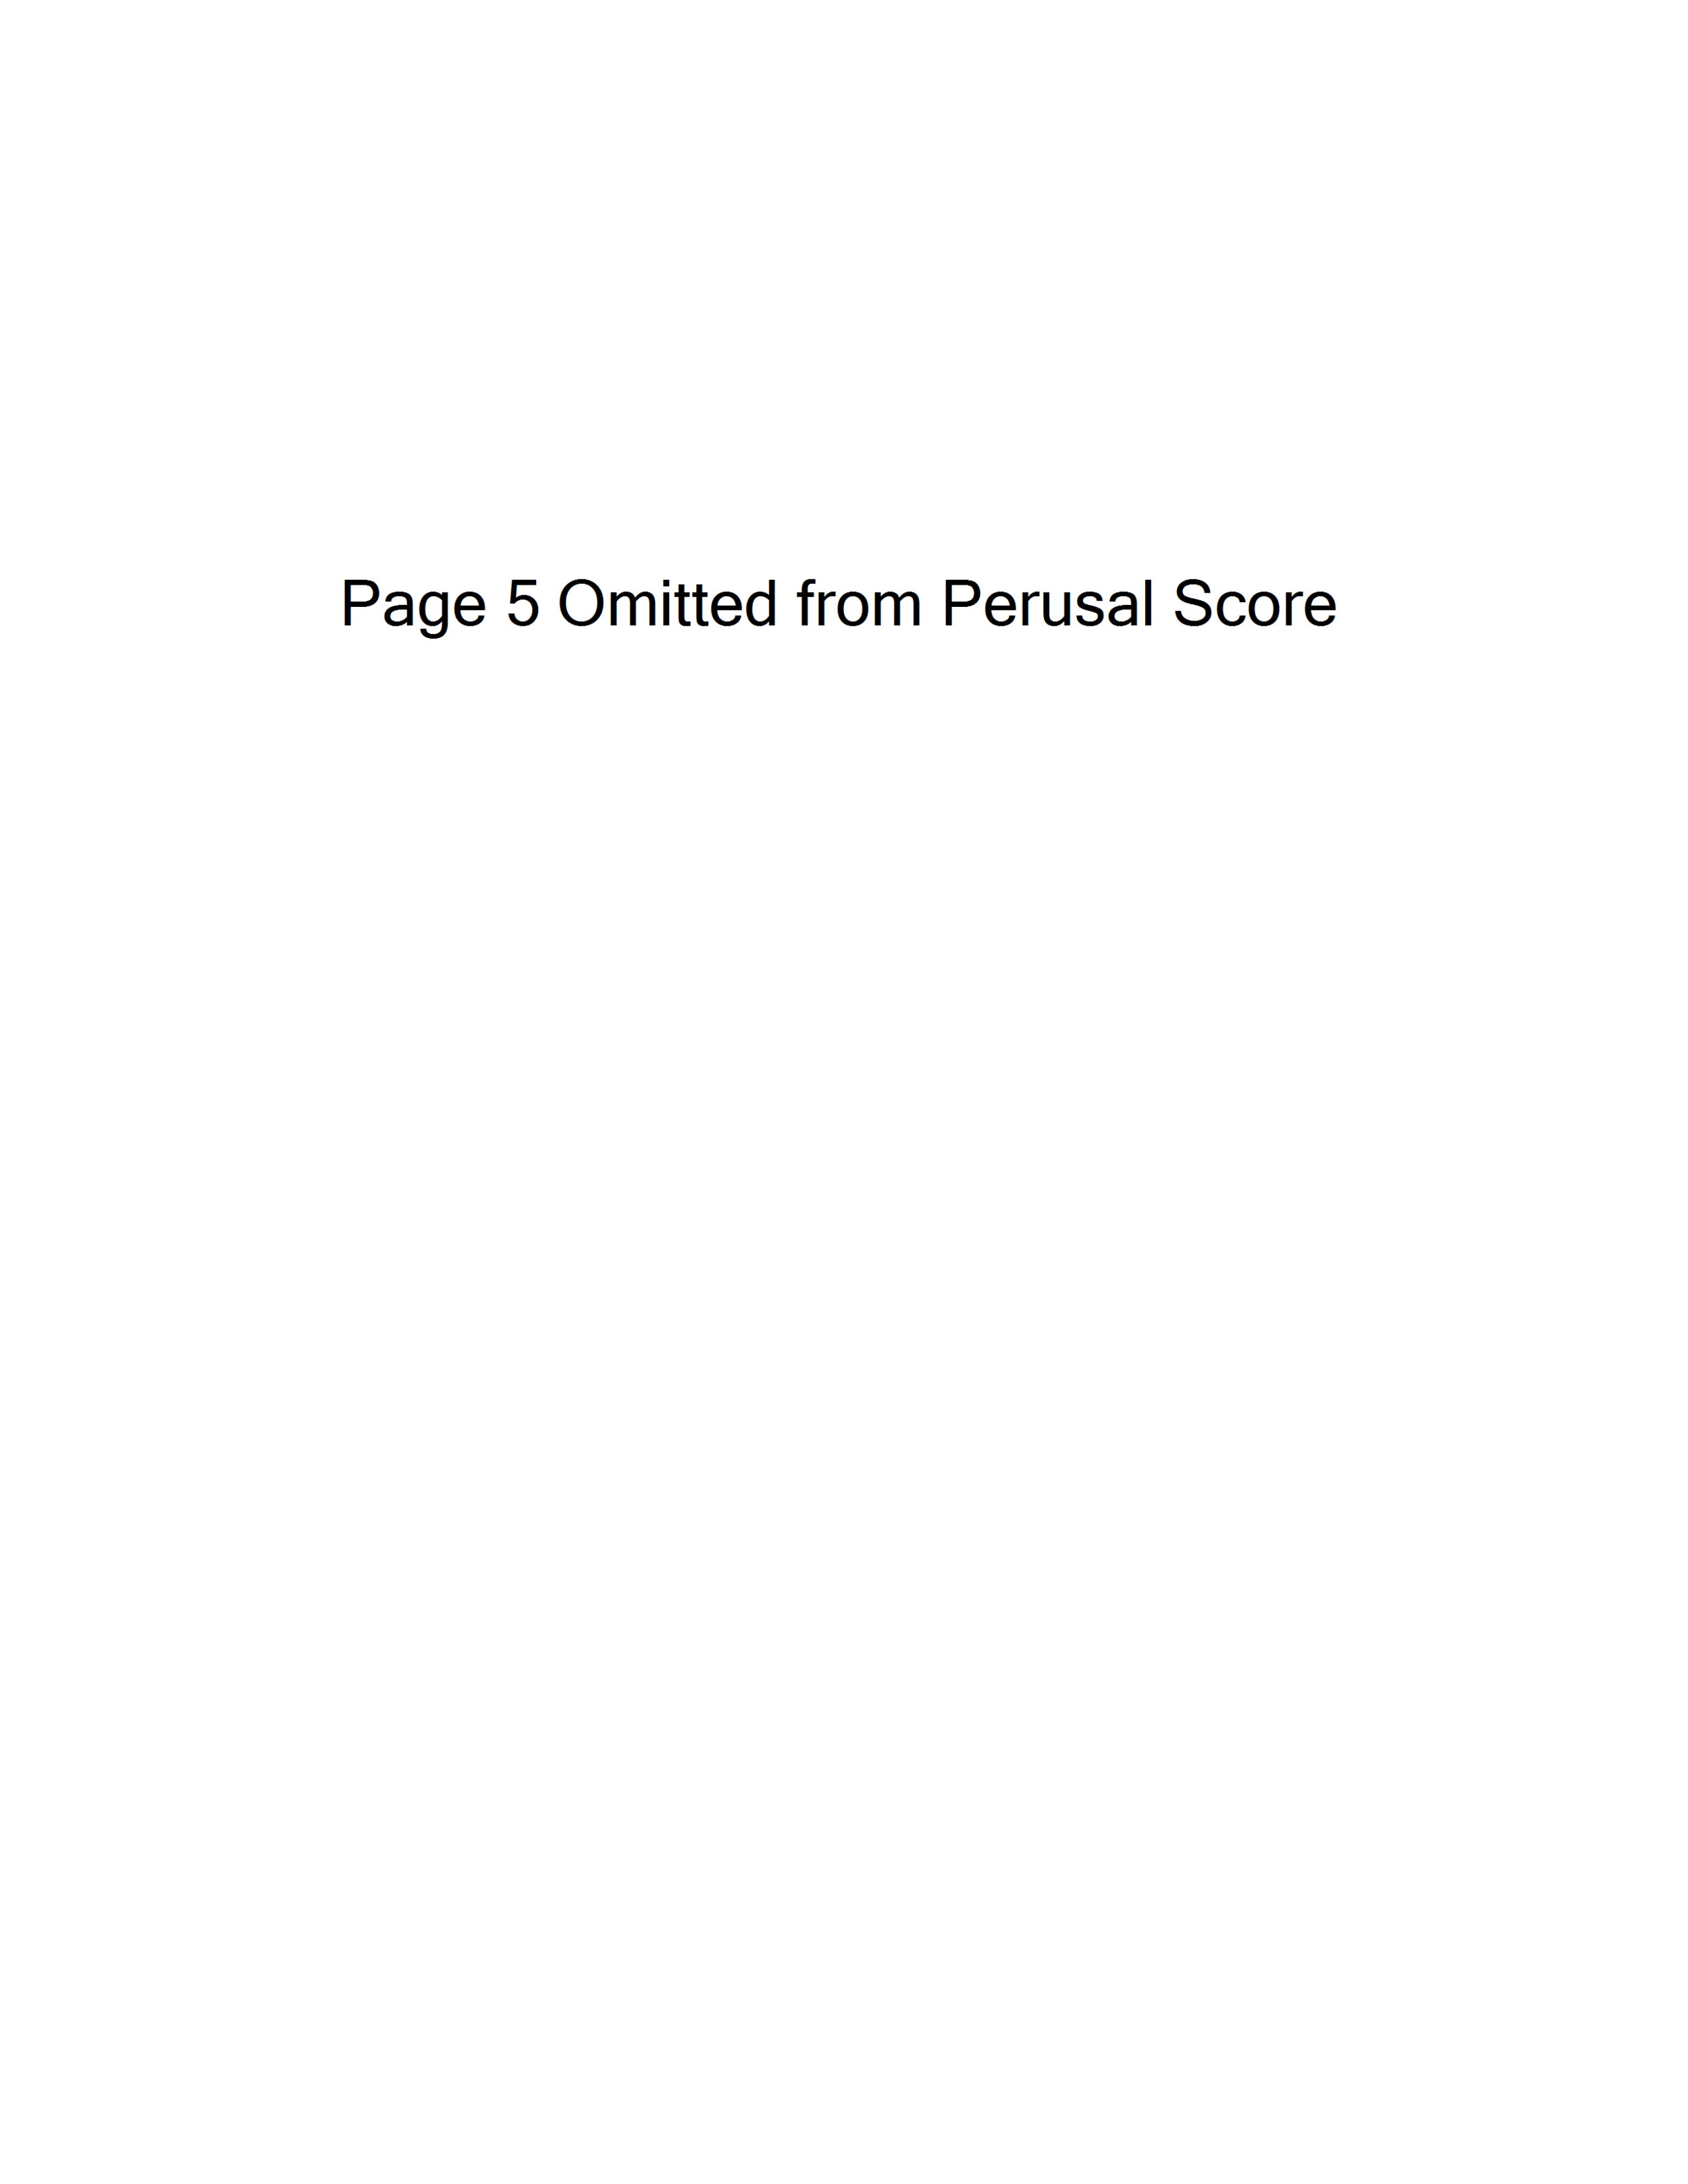 Prelude Perusal-7-o.png